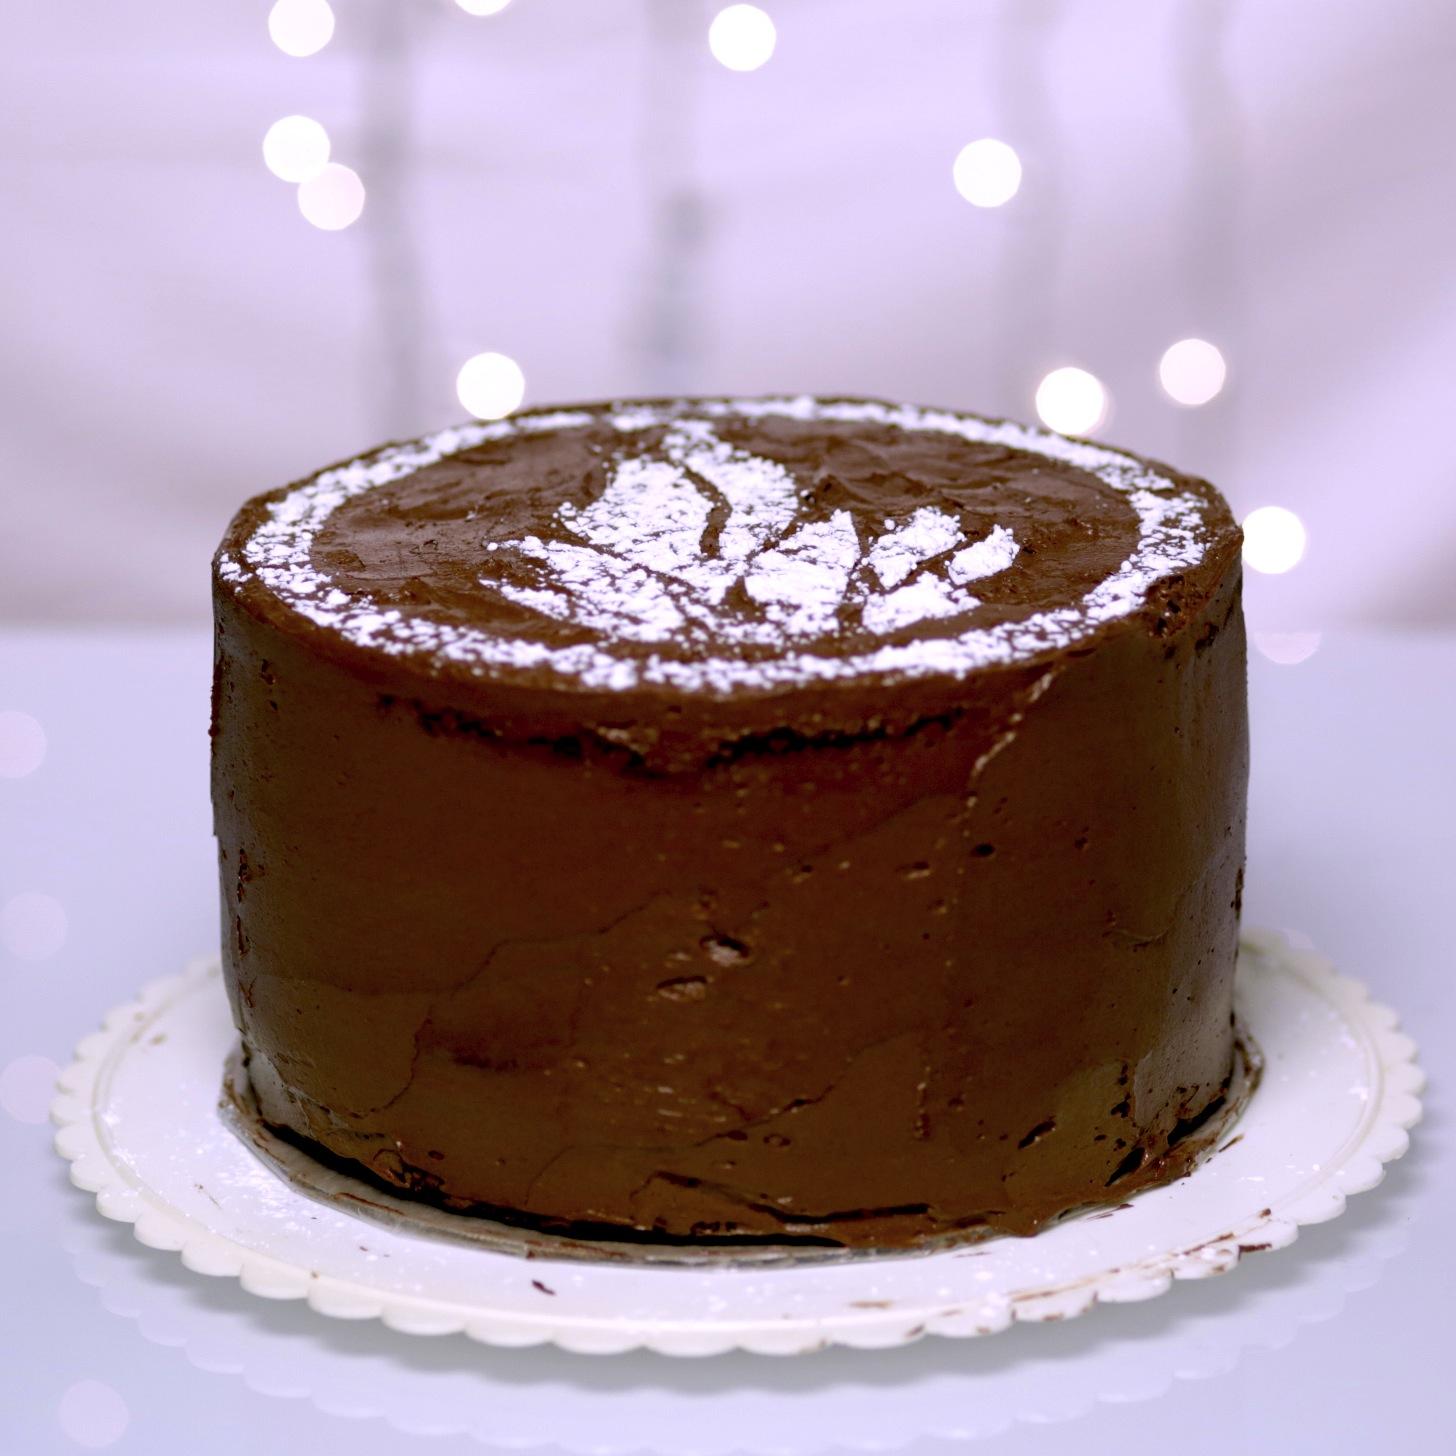 Divergent Dauntless Chocolate Cake